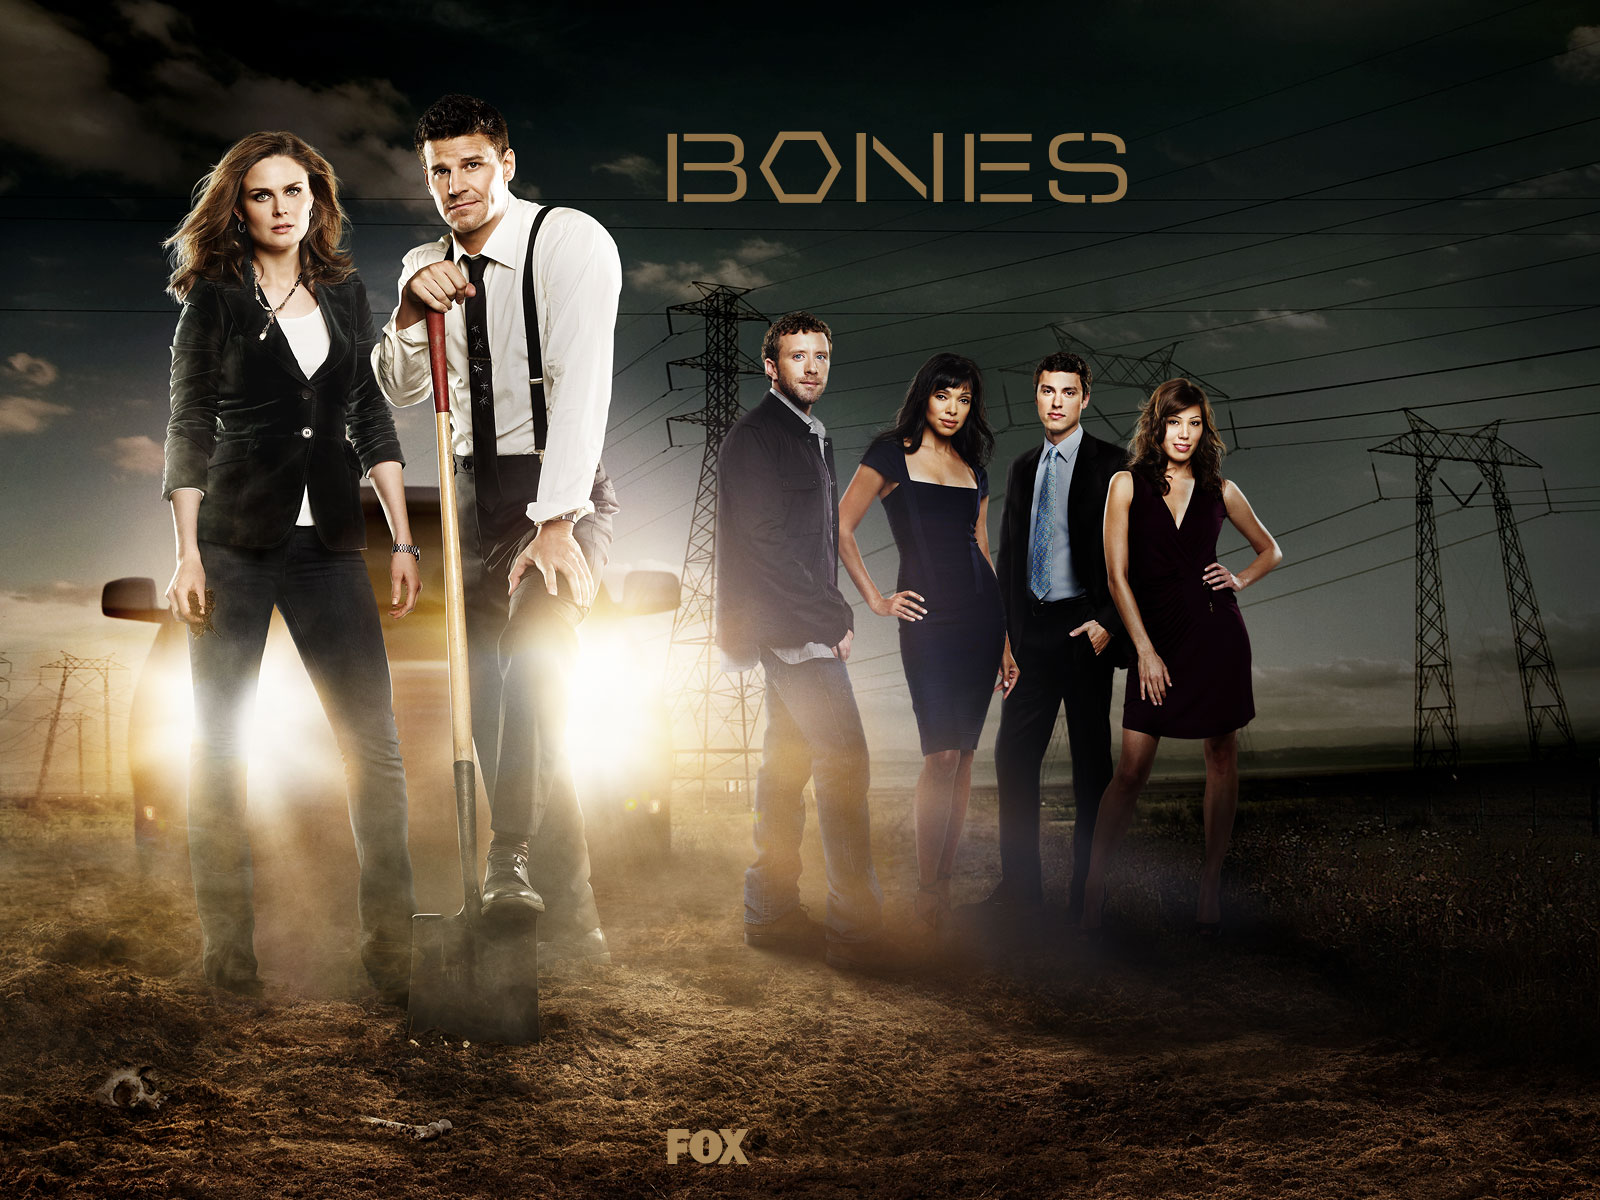 http://4.bp.blogspot.com/-8YfM5o8r-ww/Tt0i6E8ywTI/AAAAAAAADFs/JeIrKBosD5c/s1600/bones_wall05_1600x1200.jpg